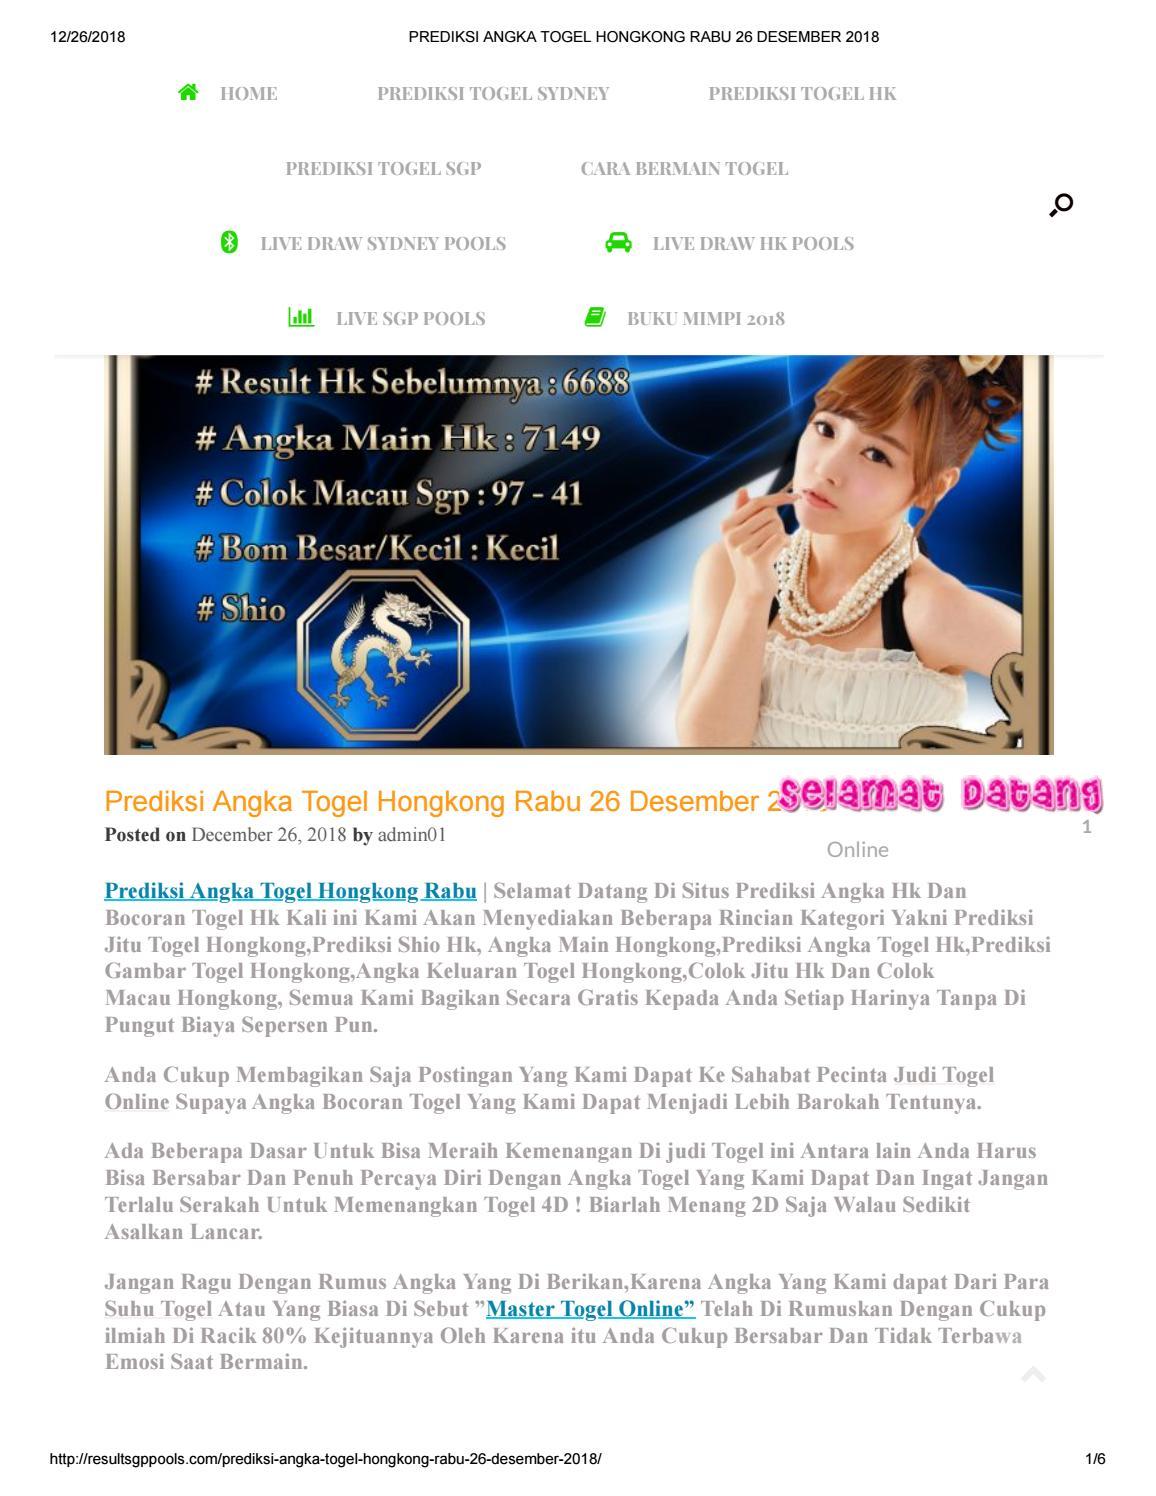 Prediksi Angka Togel Hongkong Rabu 26 Desember 2018 by angelina1310